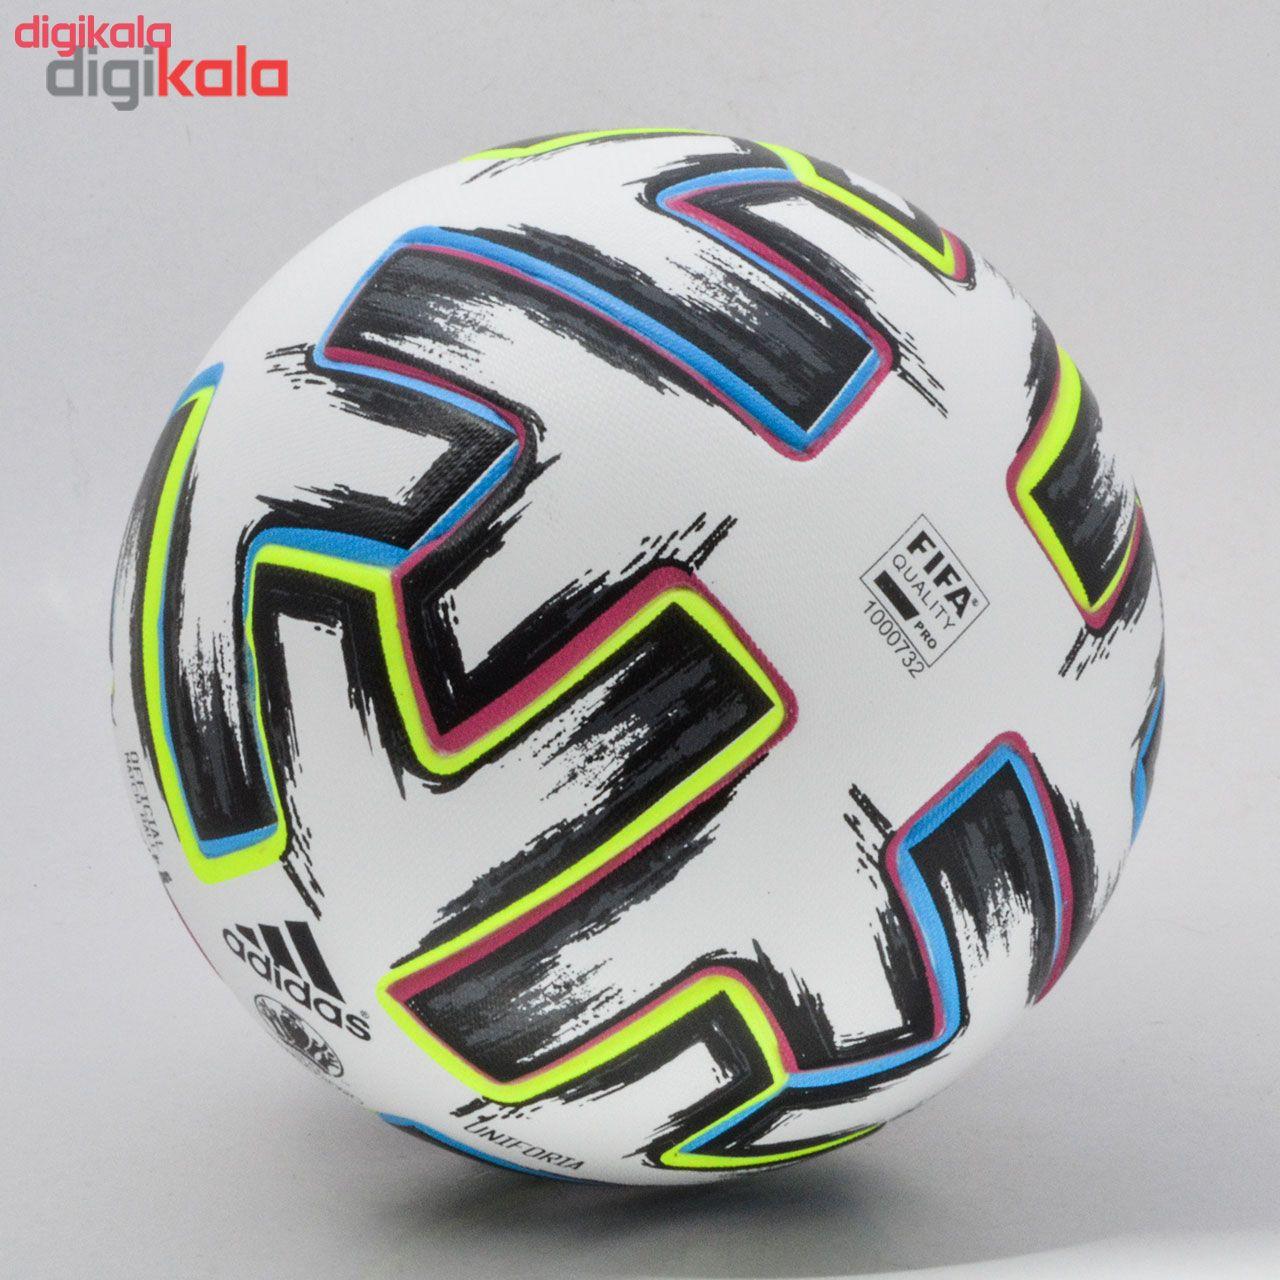 توپ فوتبال مدل R5110 main 1 2